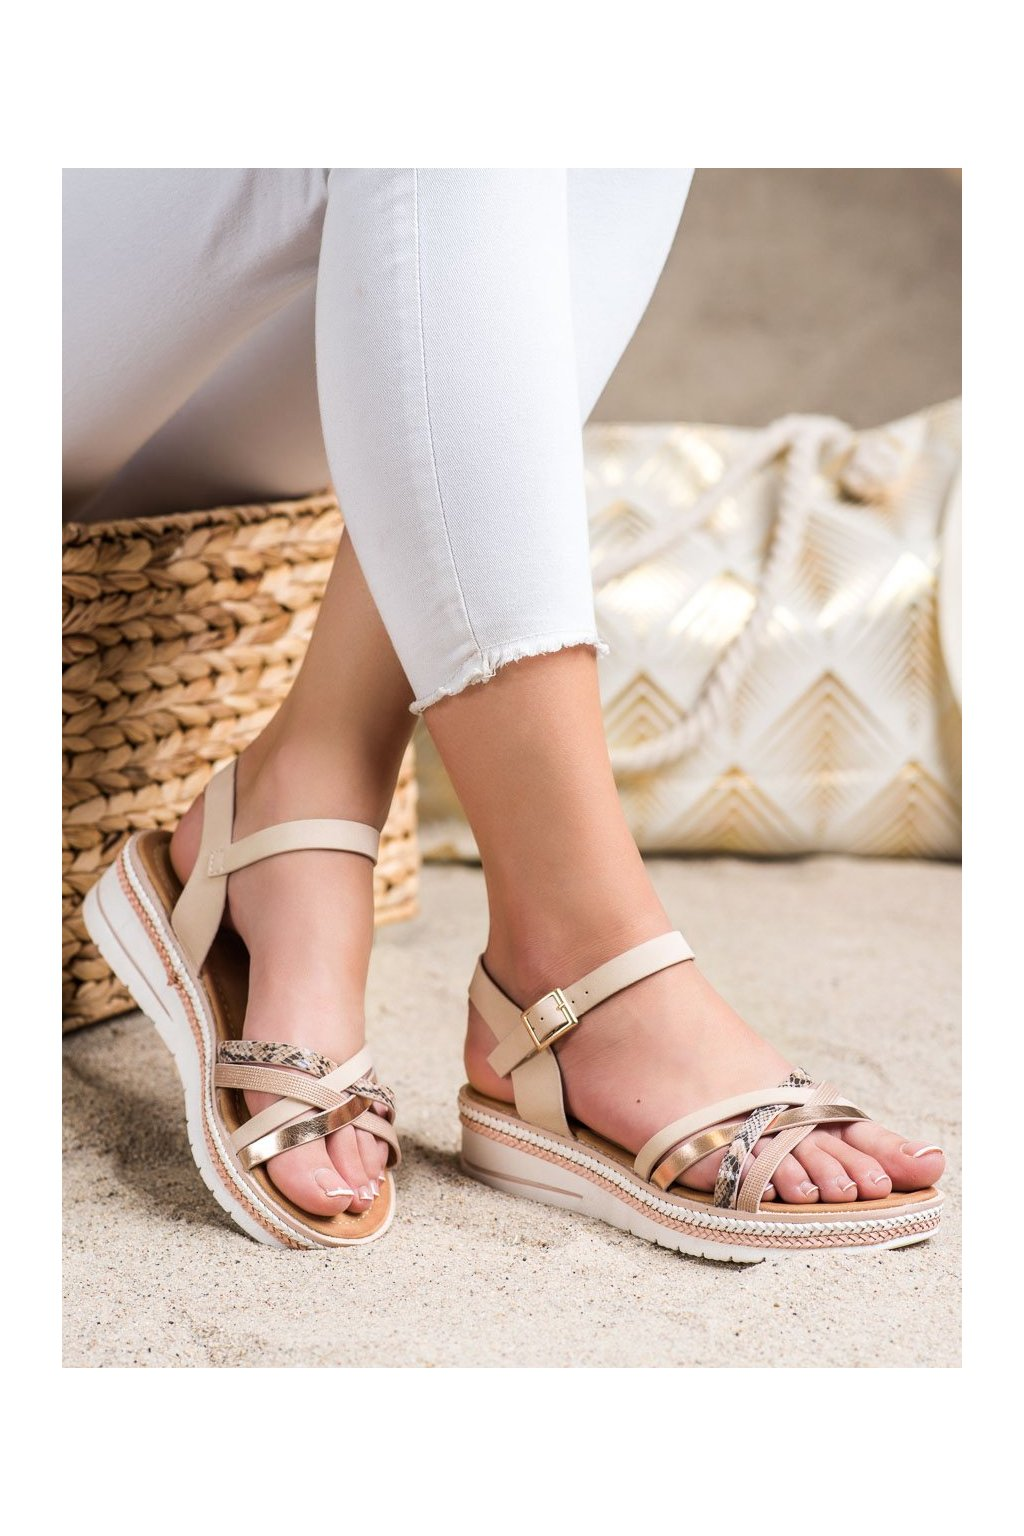 Ružové sandále Groto gogo kod G245P